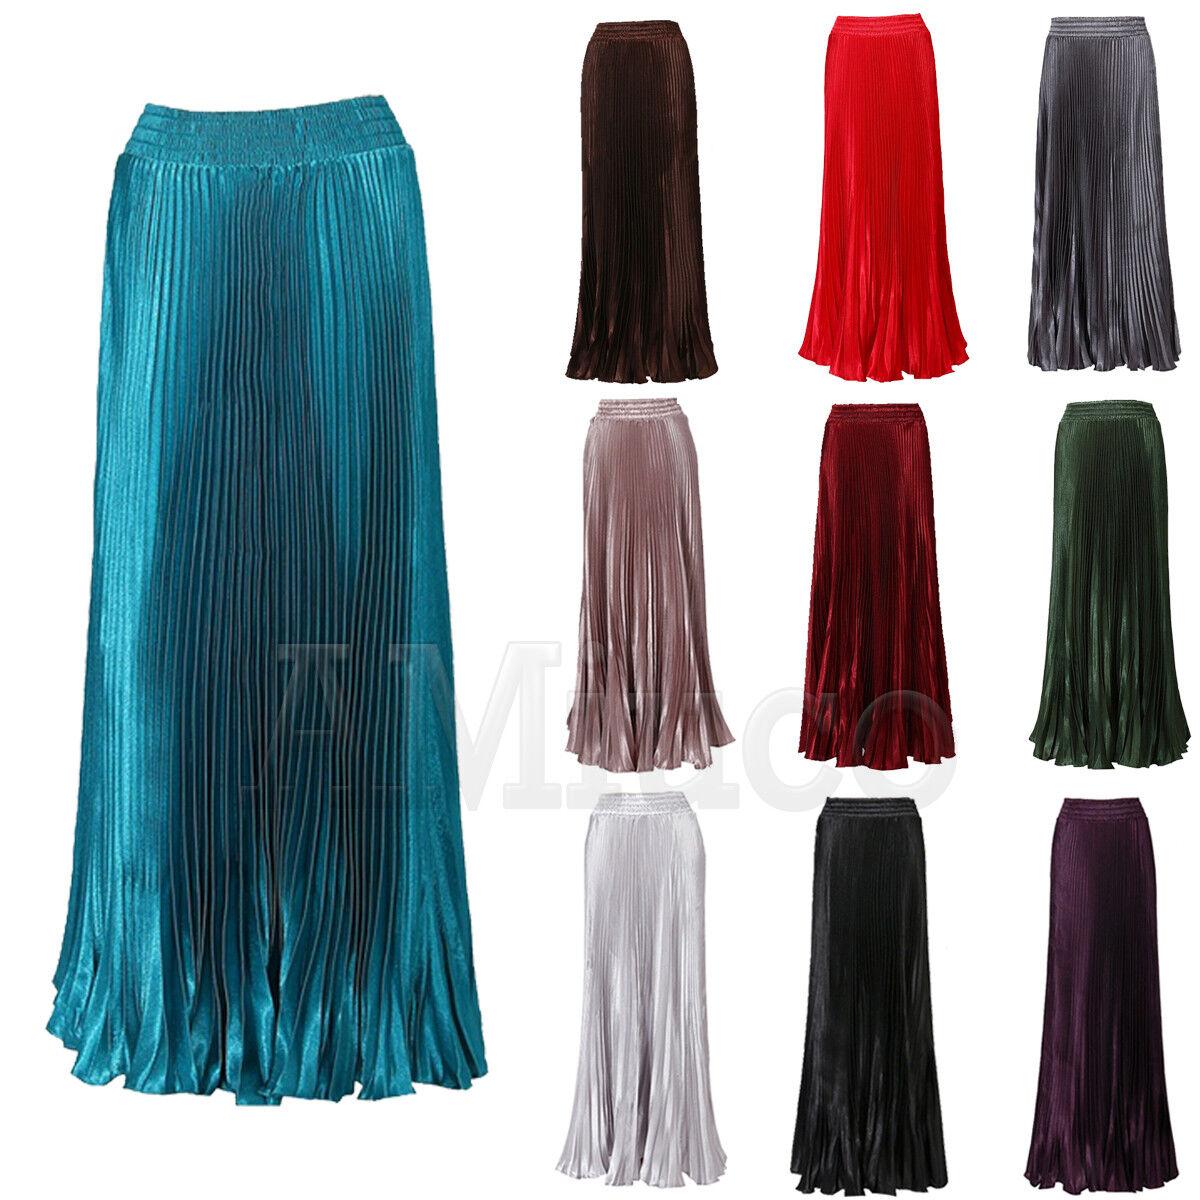 Women Elastic Waist Metallic Pleated Skirt Vintage Long Layer Pleated Maxi Dress